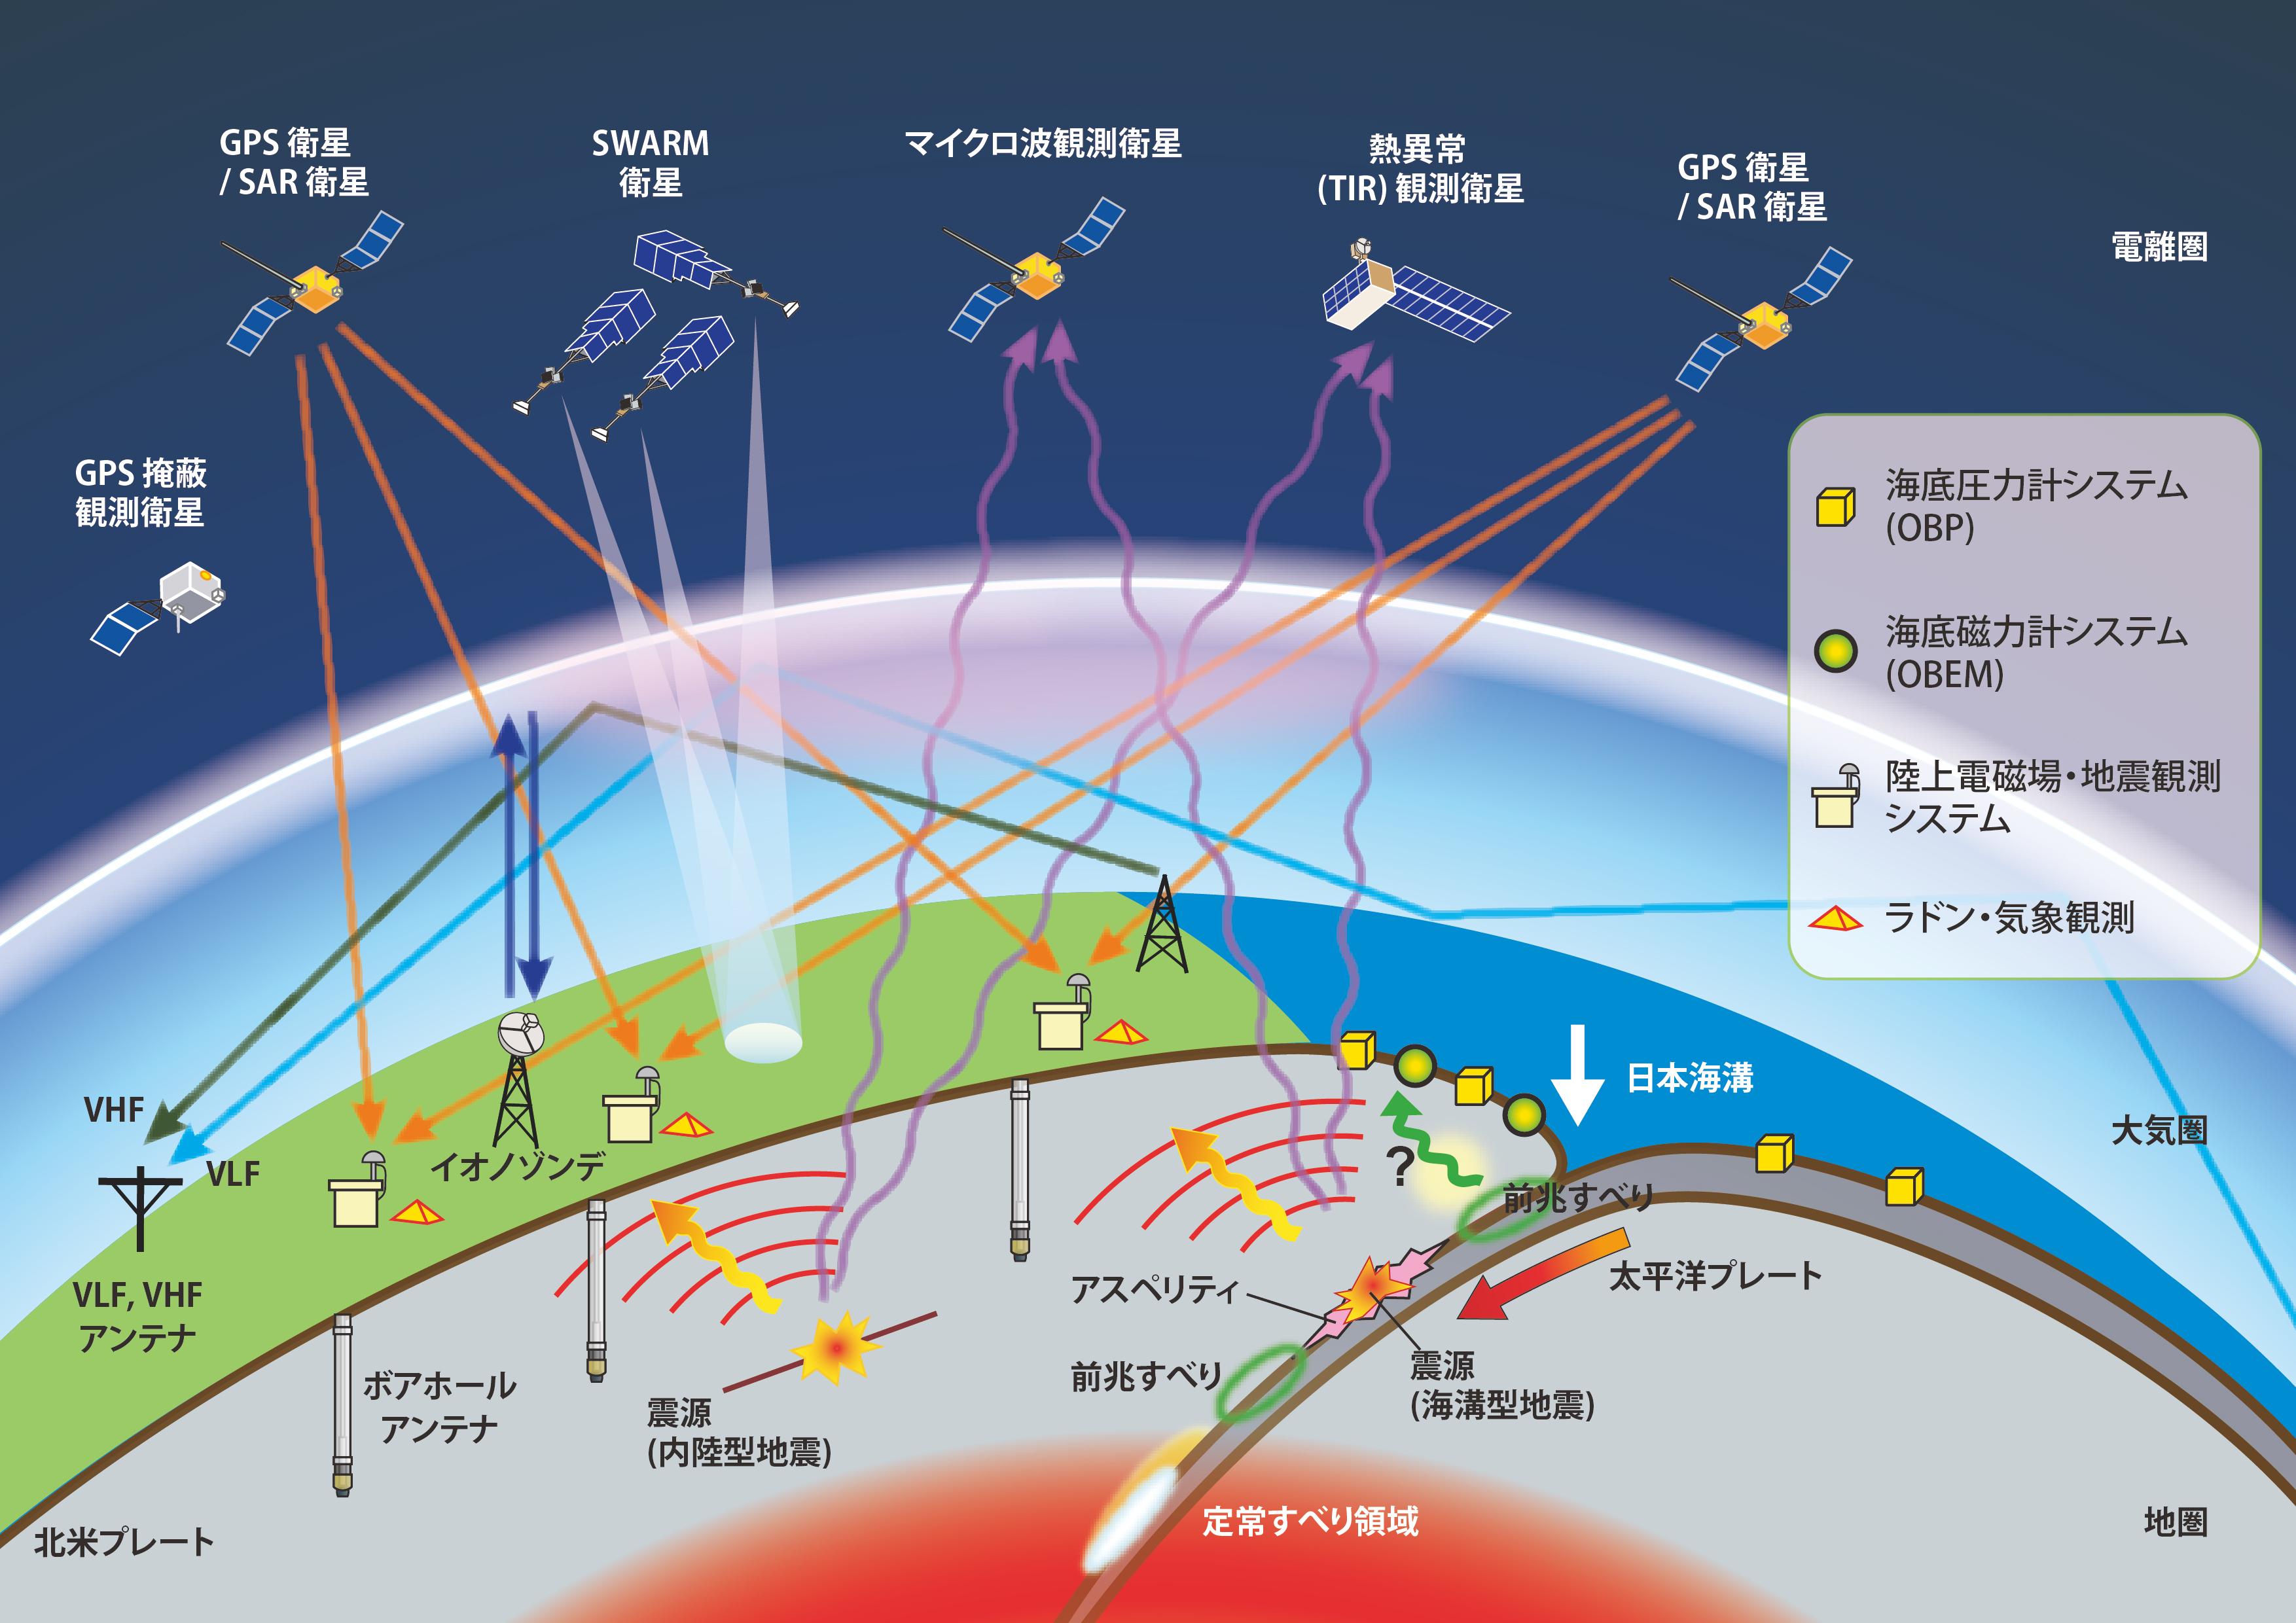 http://www.chiba-u.ac.jp/research/result/img/result57_2.jpg